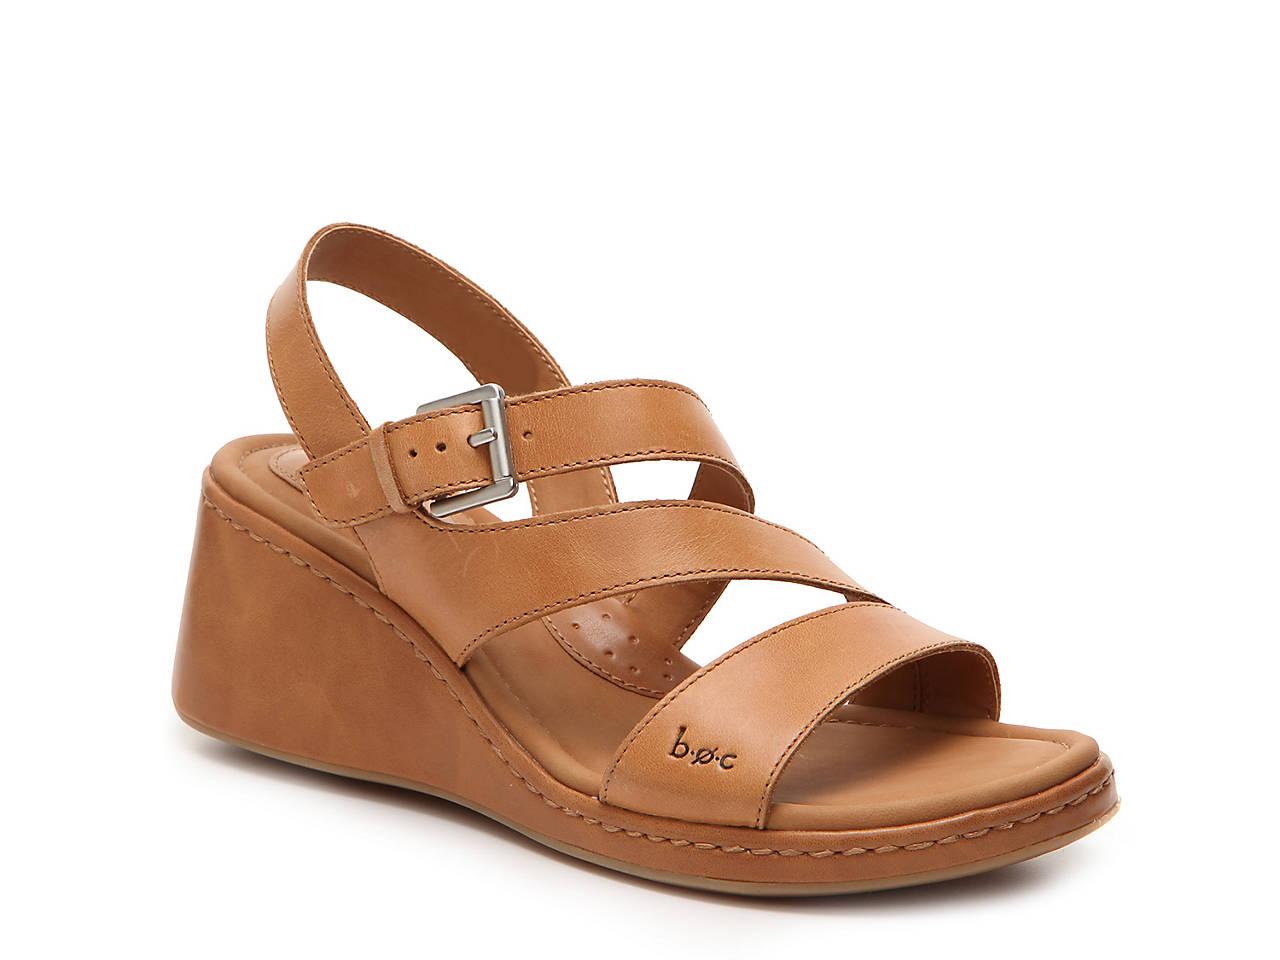 78aa0707d98c b.o.c Alma Wedge Sandal Women s Shoes